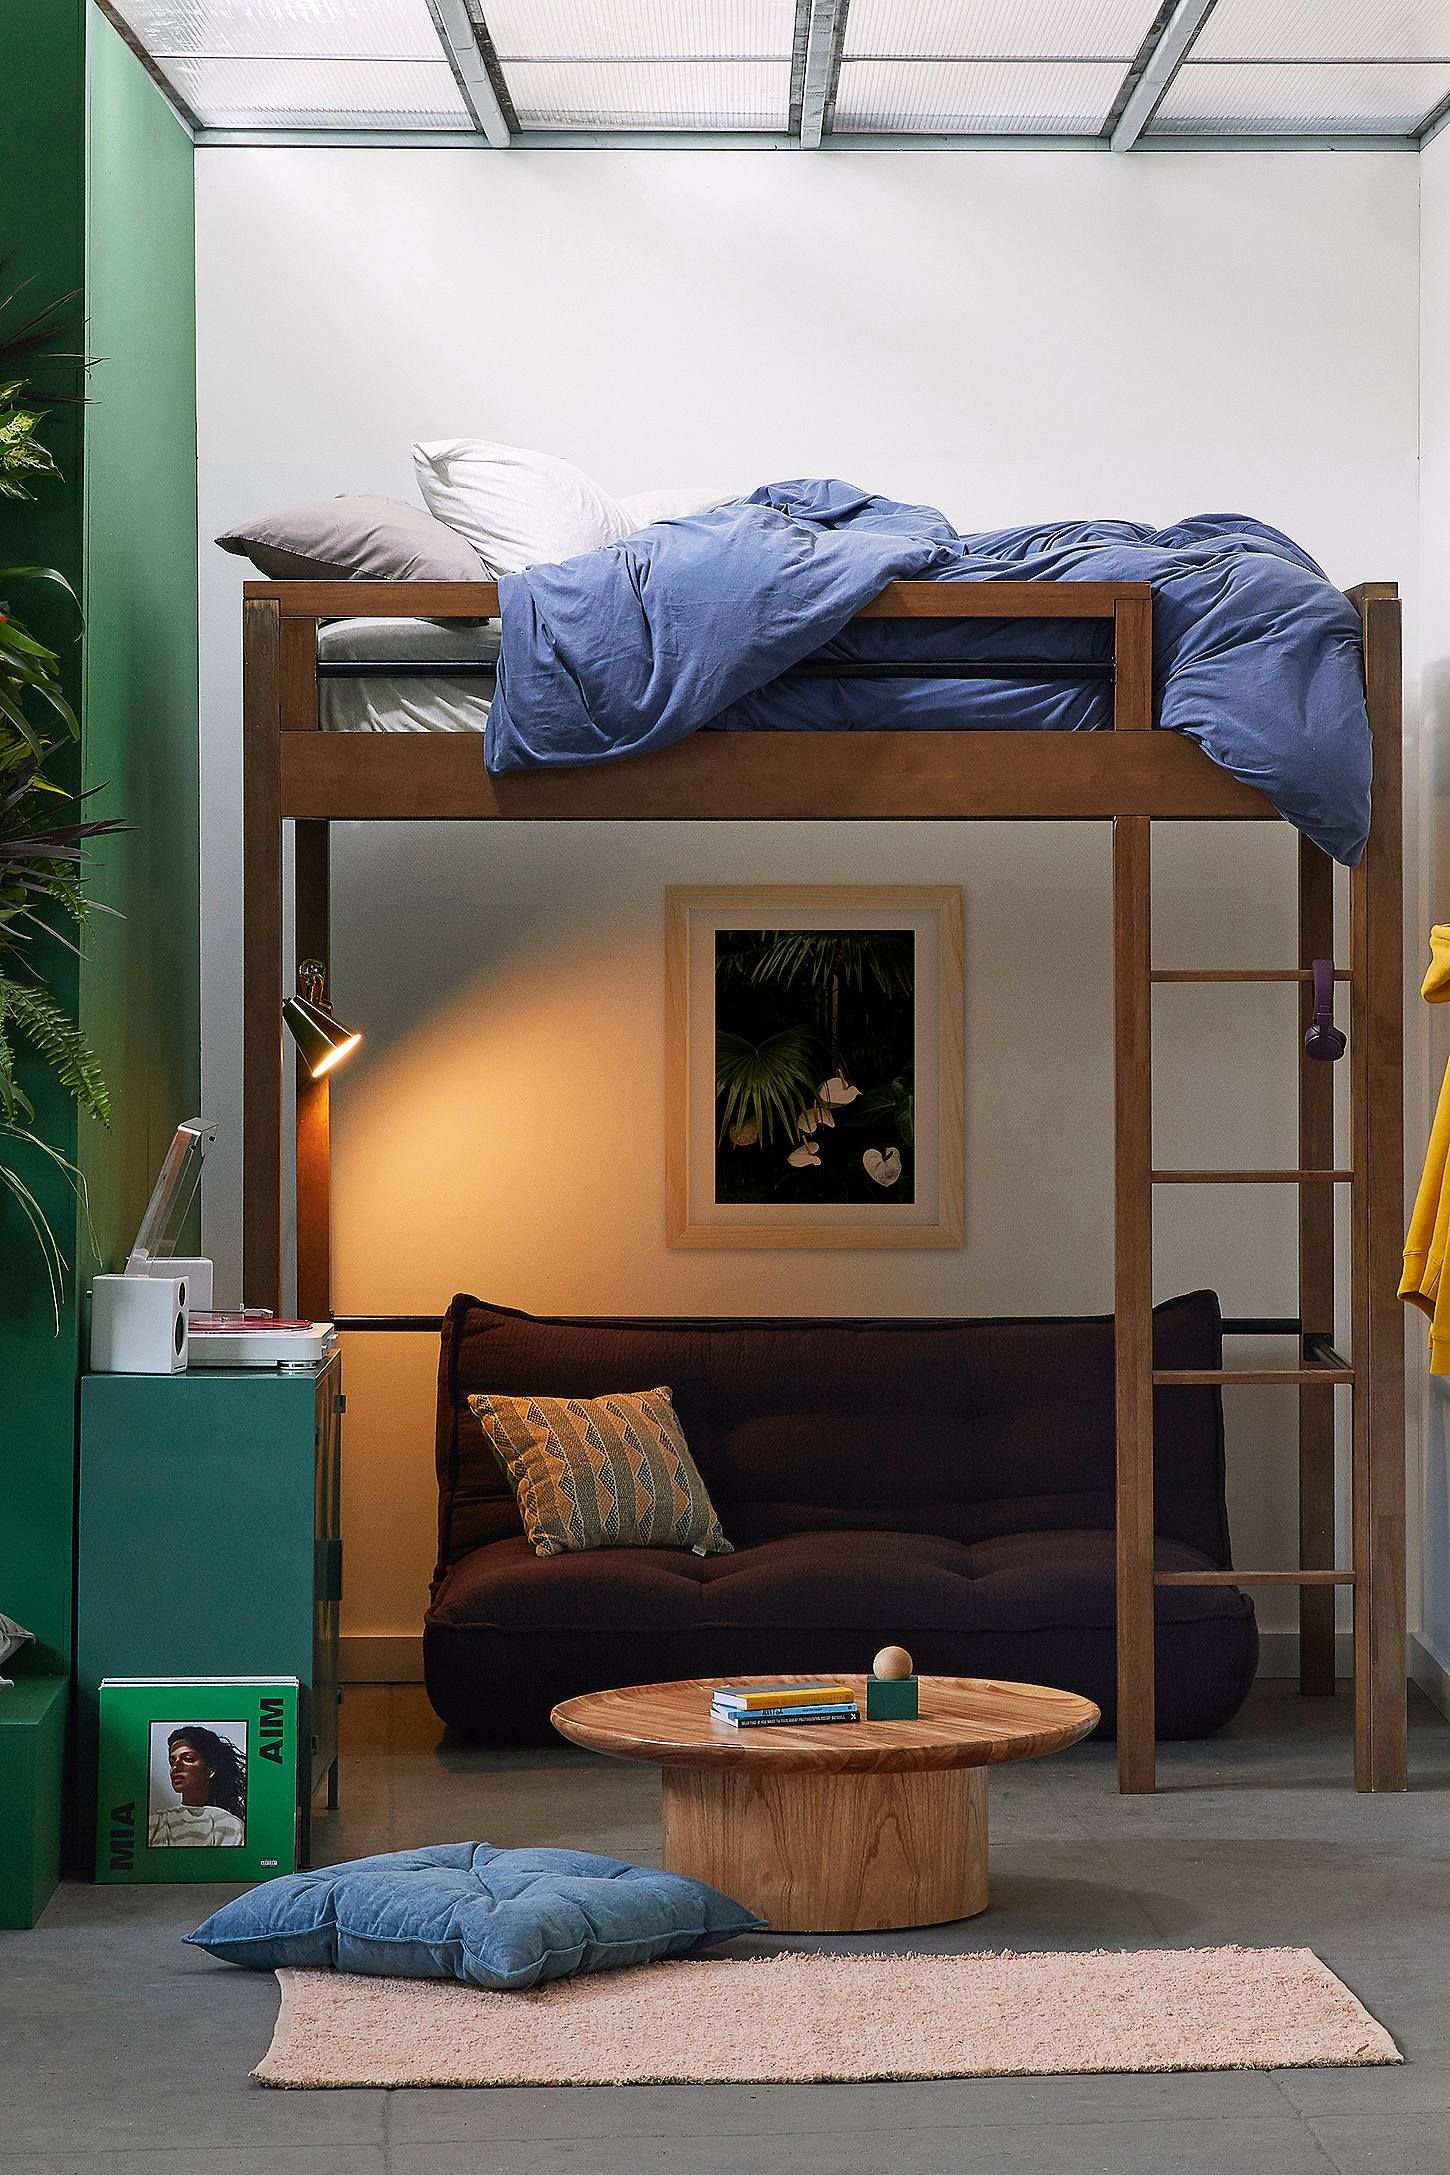 Slide for loft bed  Fulton Loft Bed  Fulton Lofts and Interiors